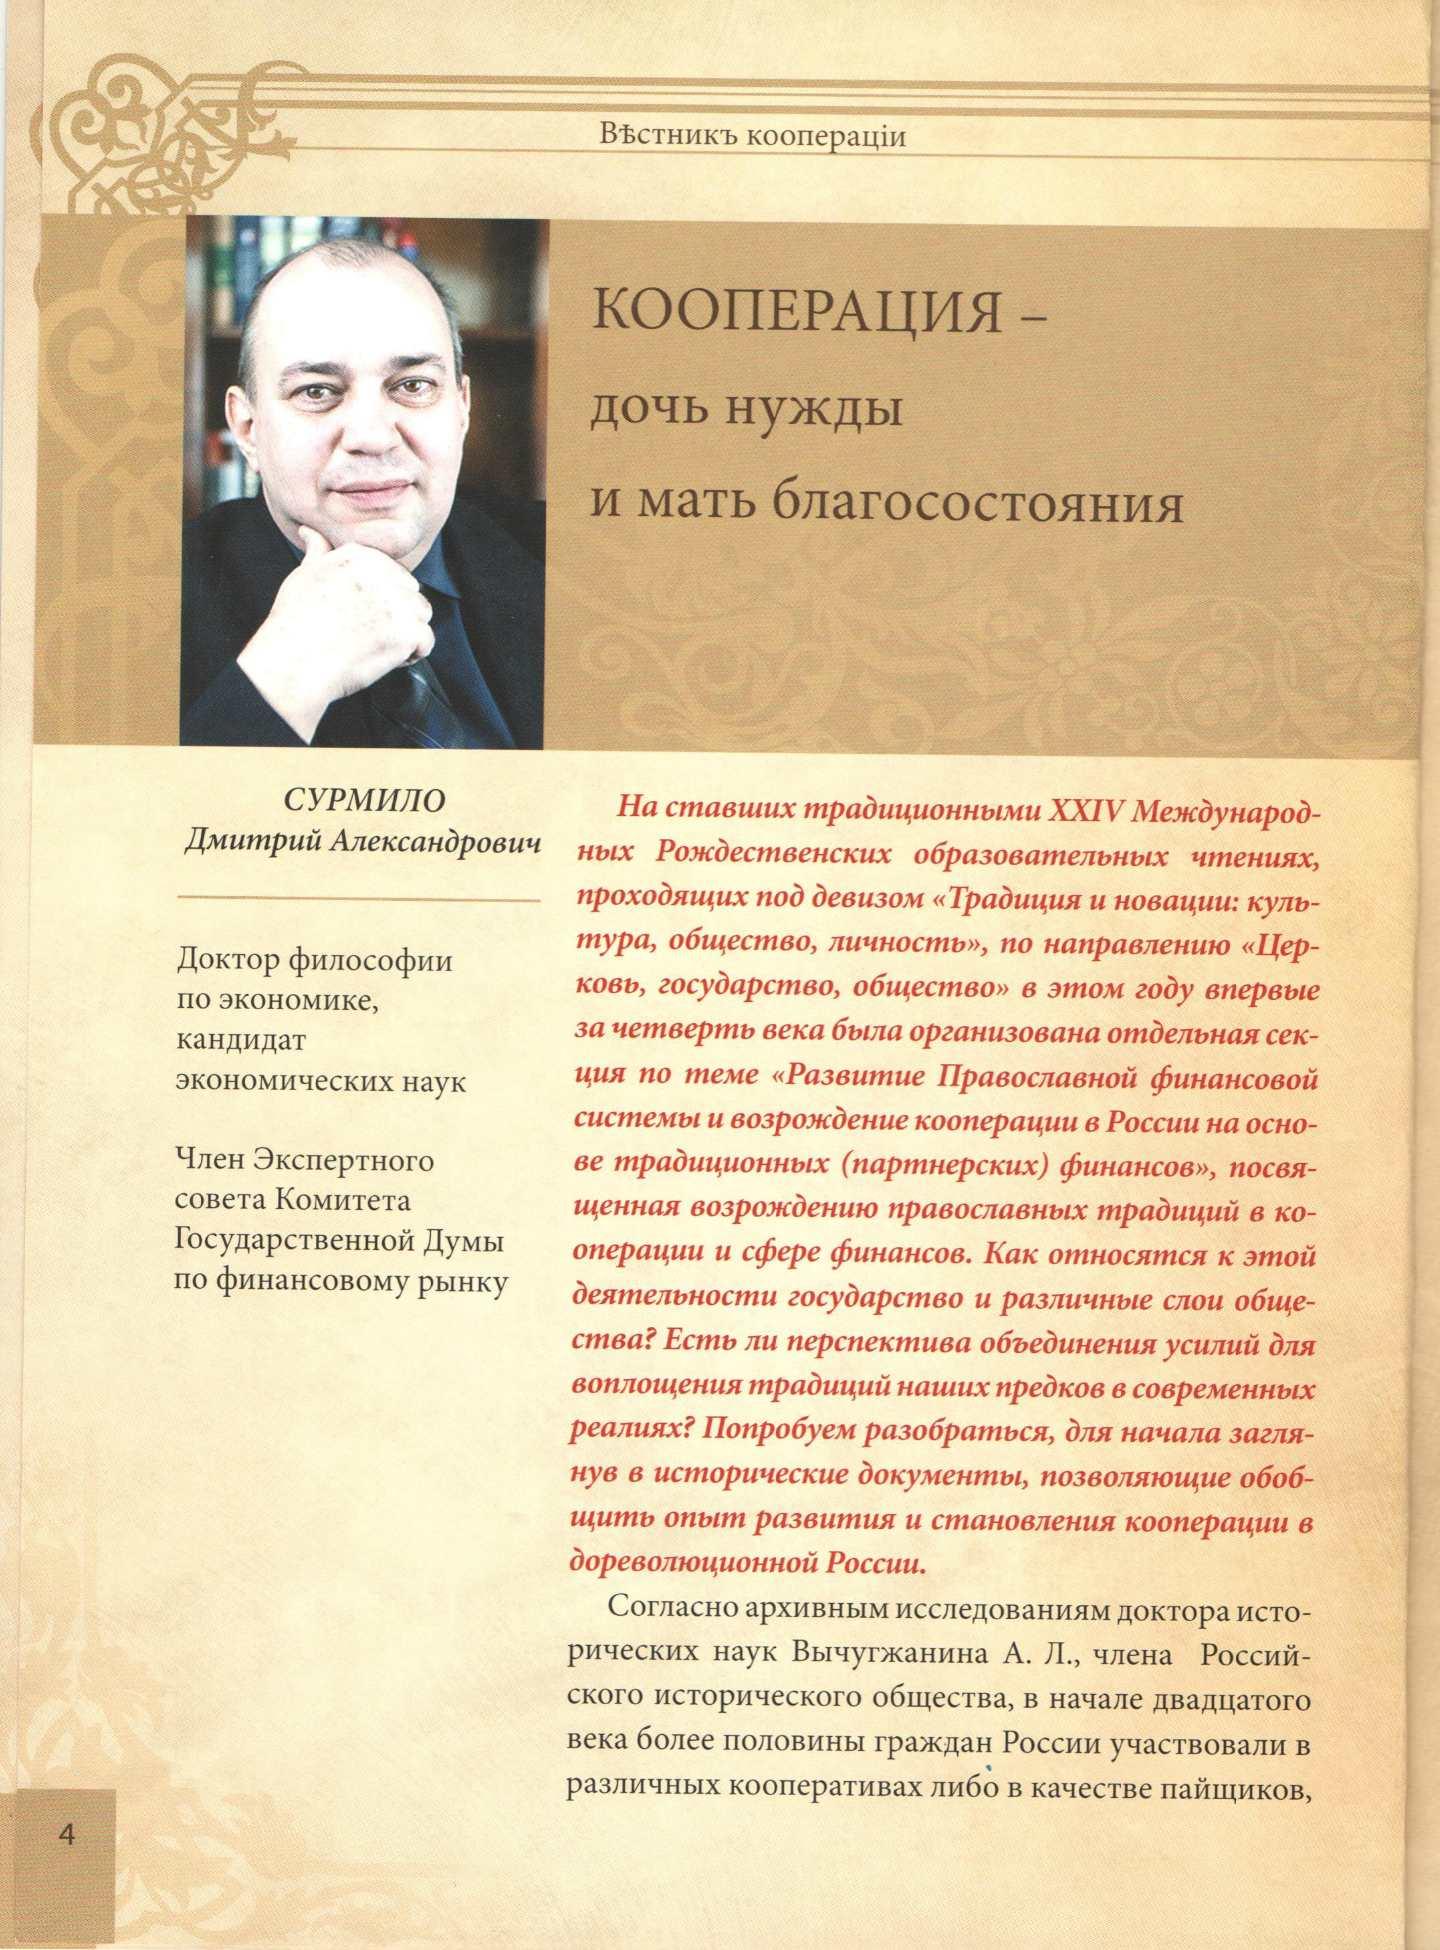 Вестник кооперации-4